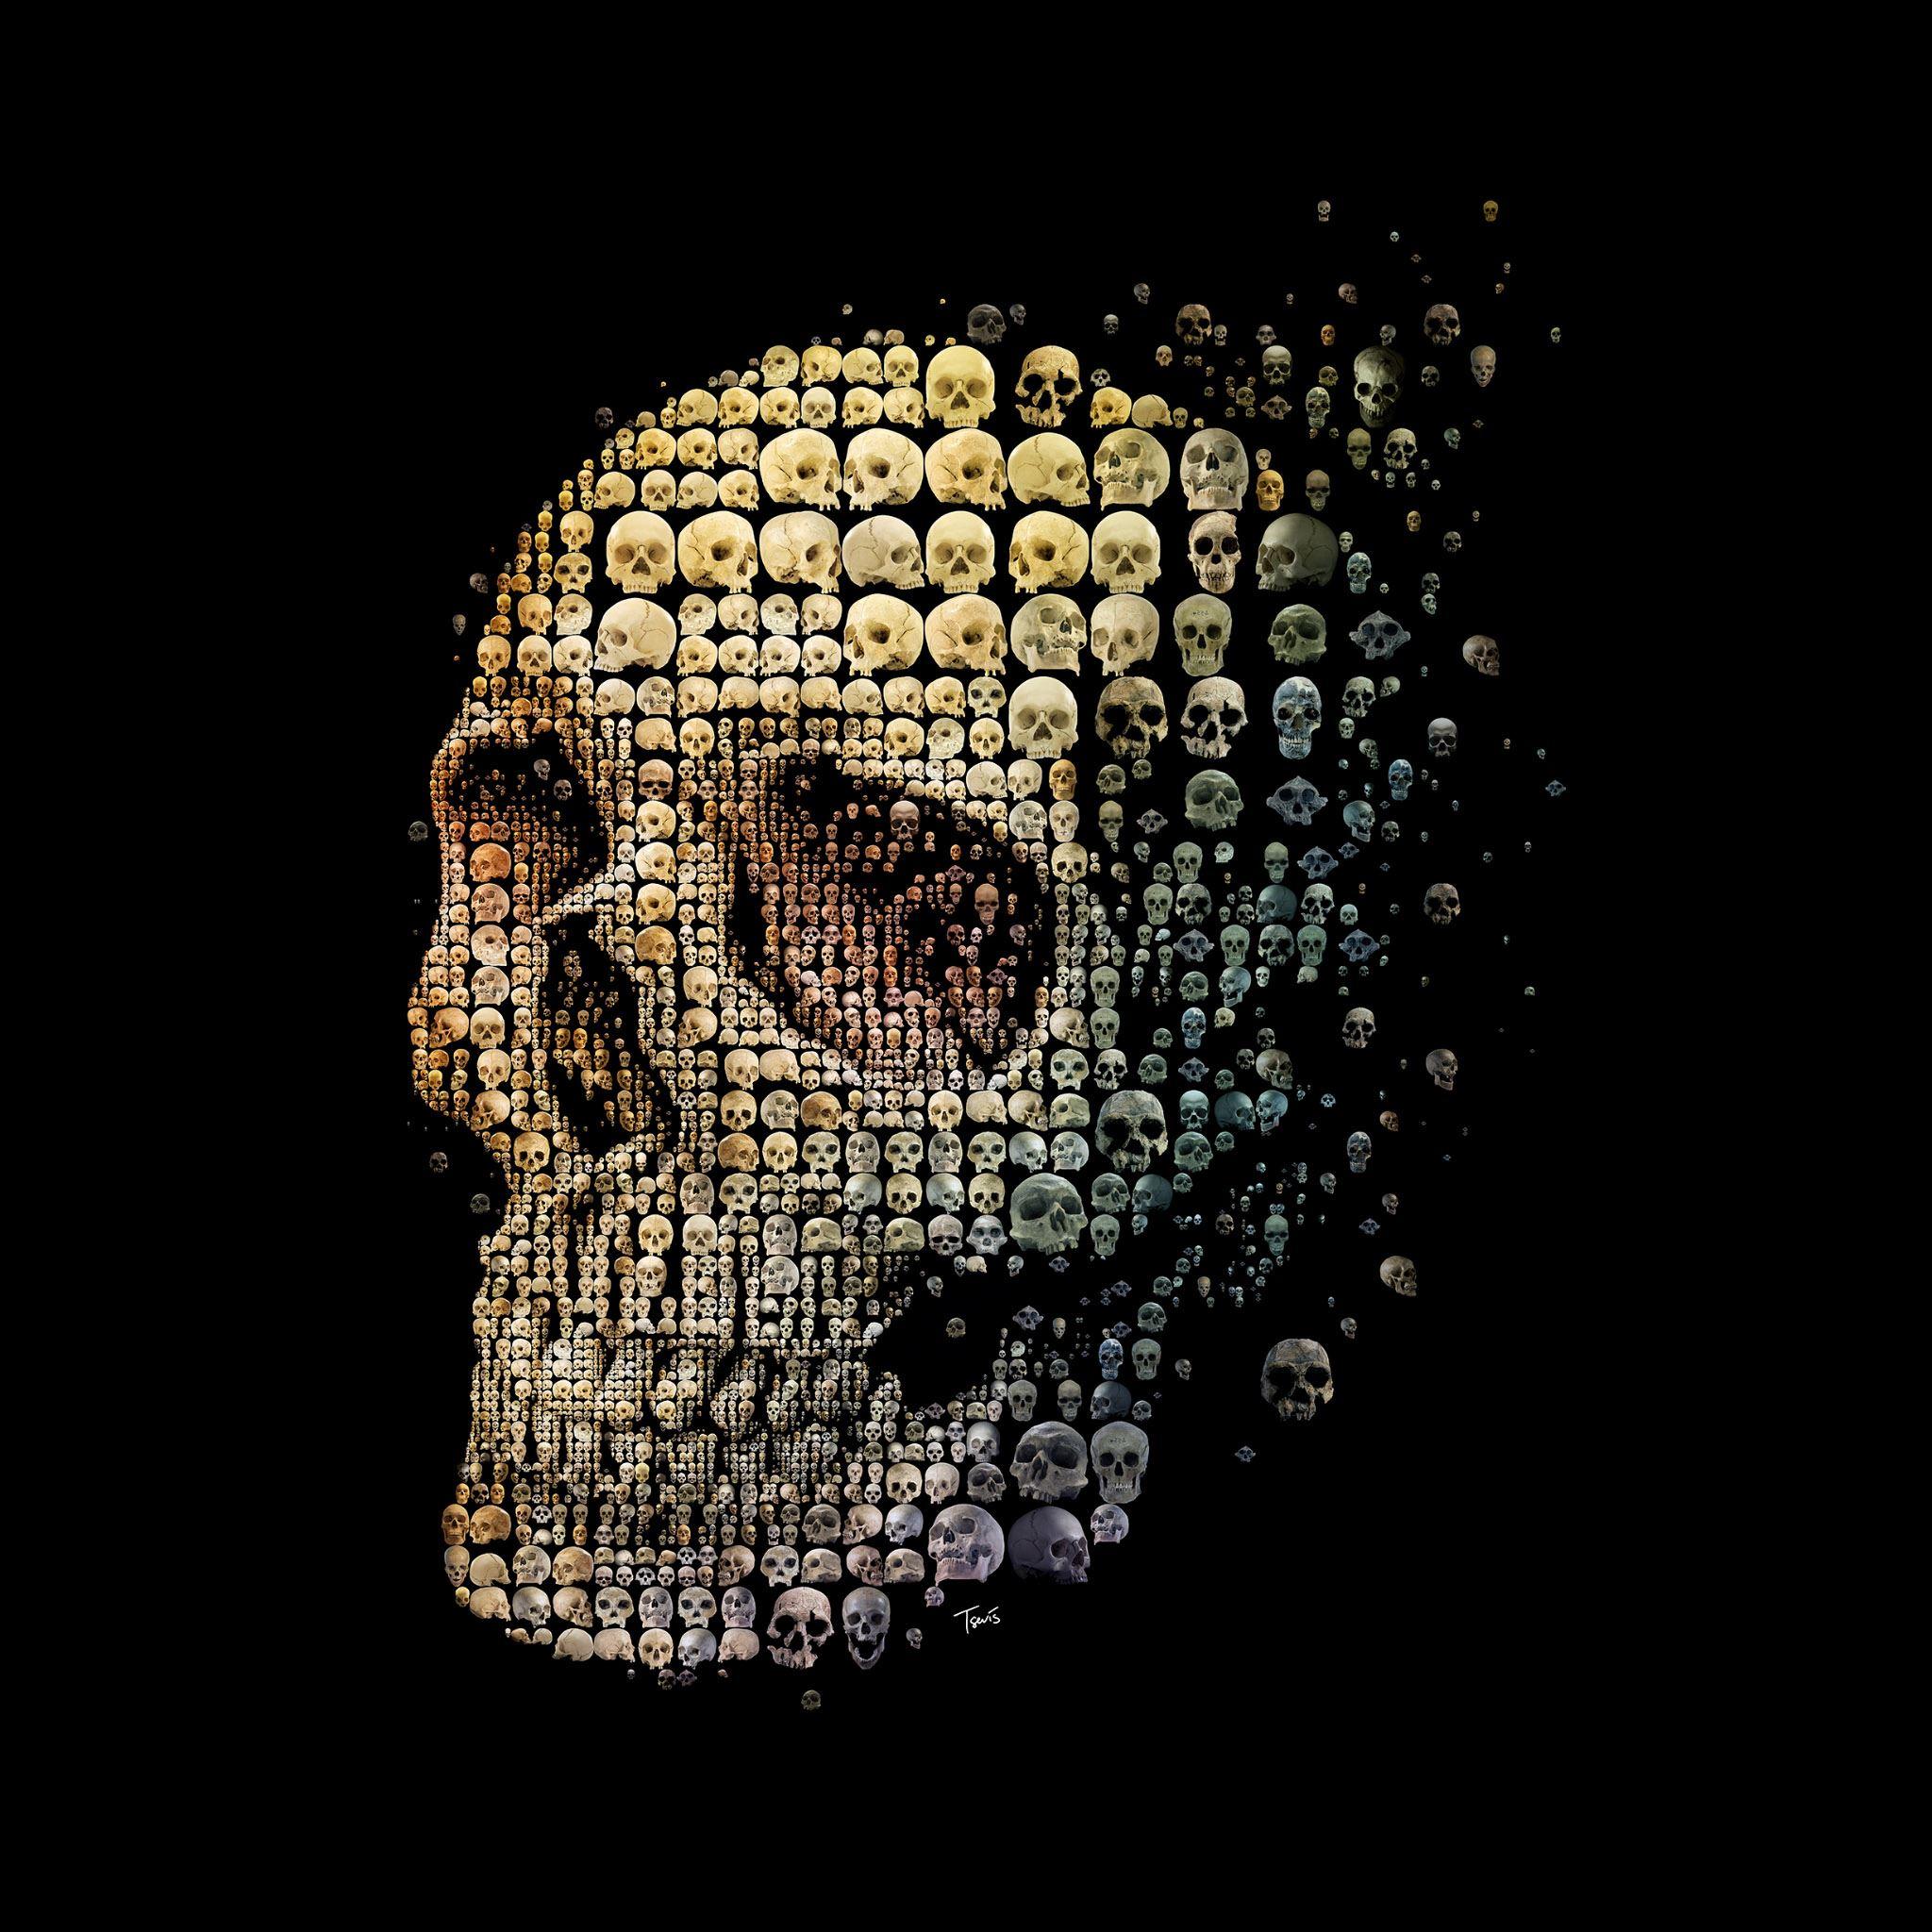 skull evolution cool ipad air wallpaper download | iphone wallpapers